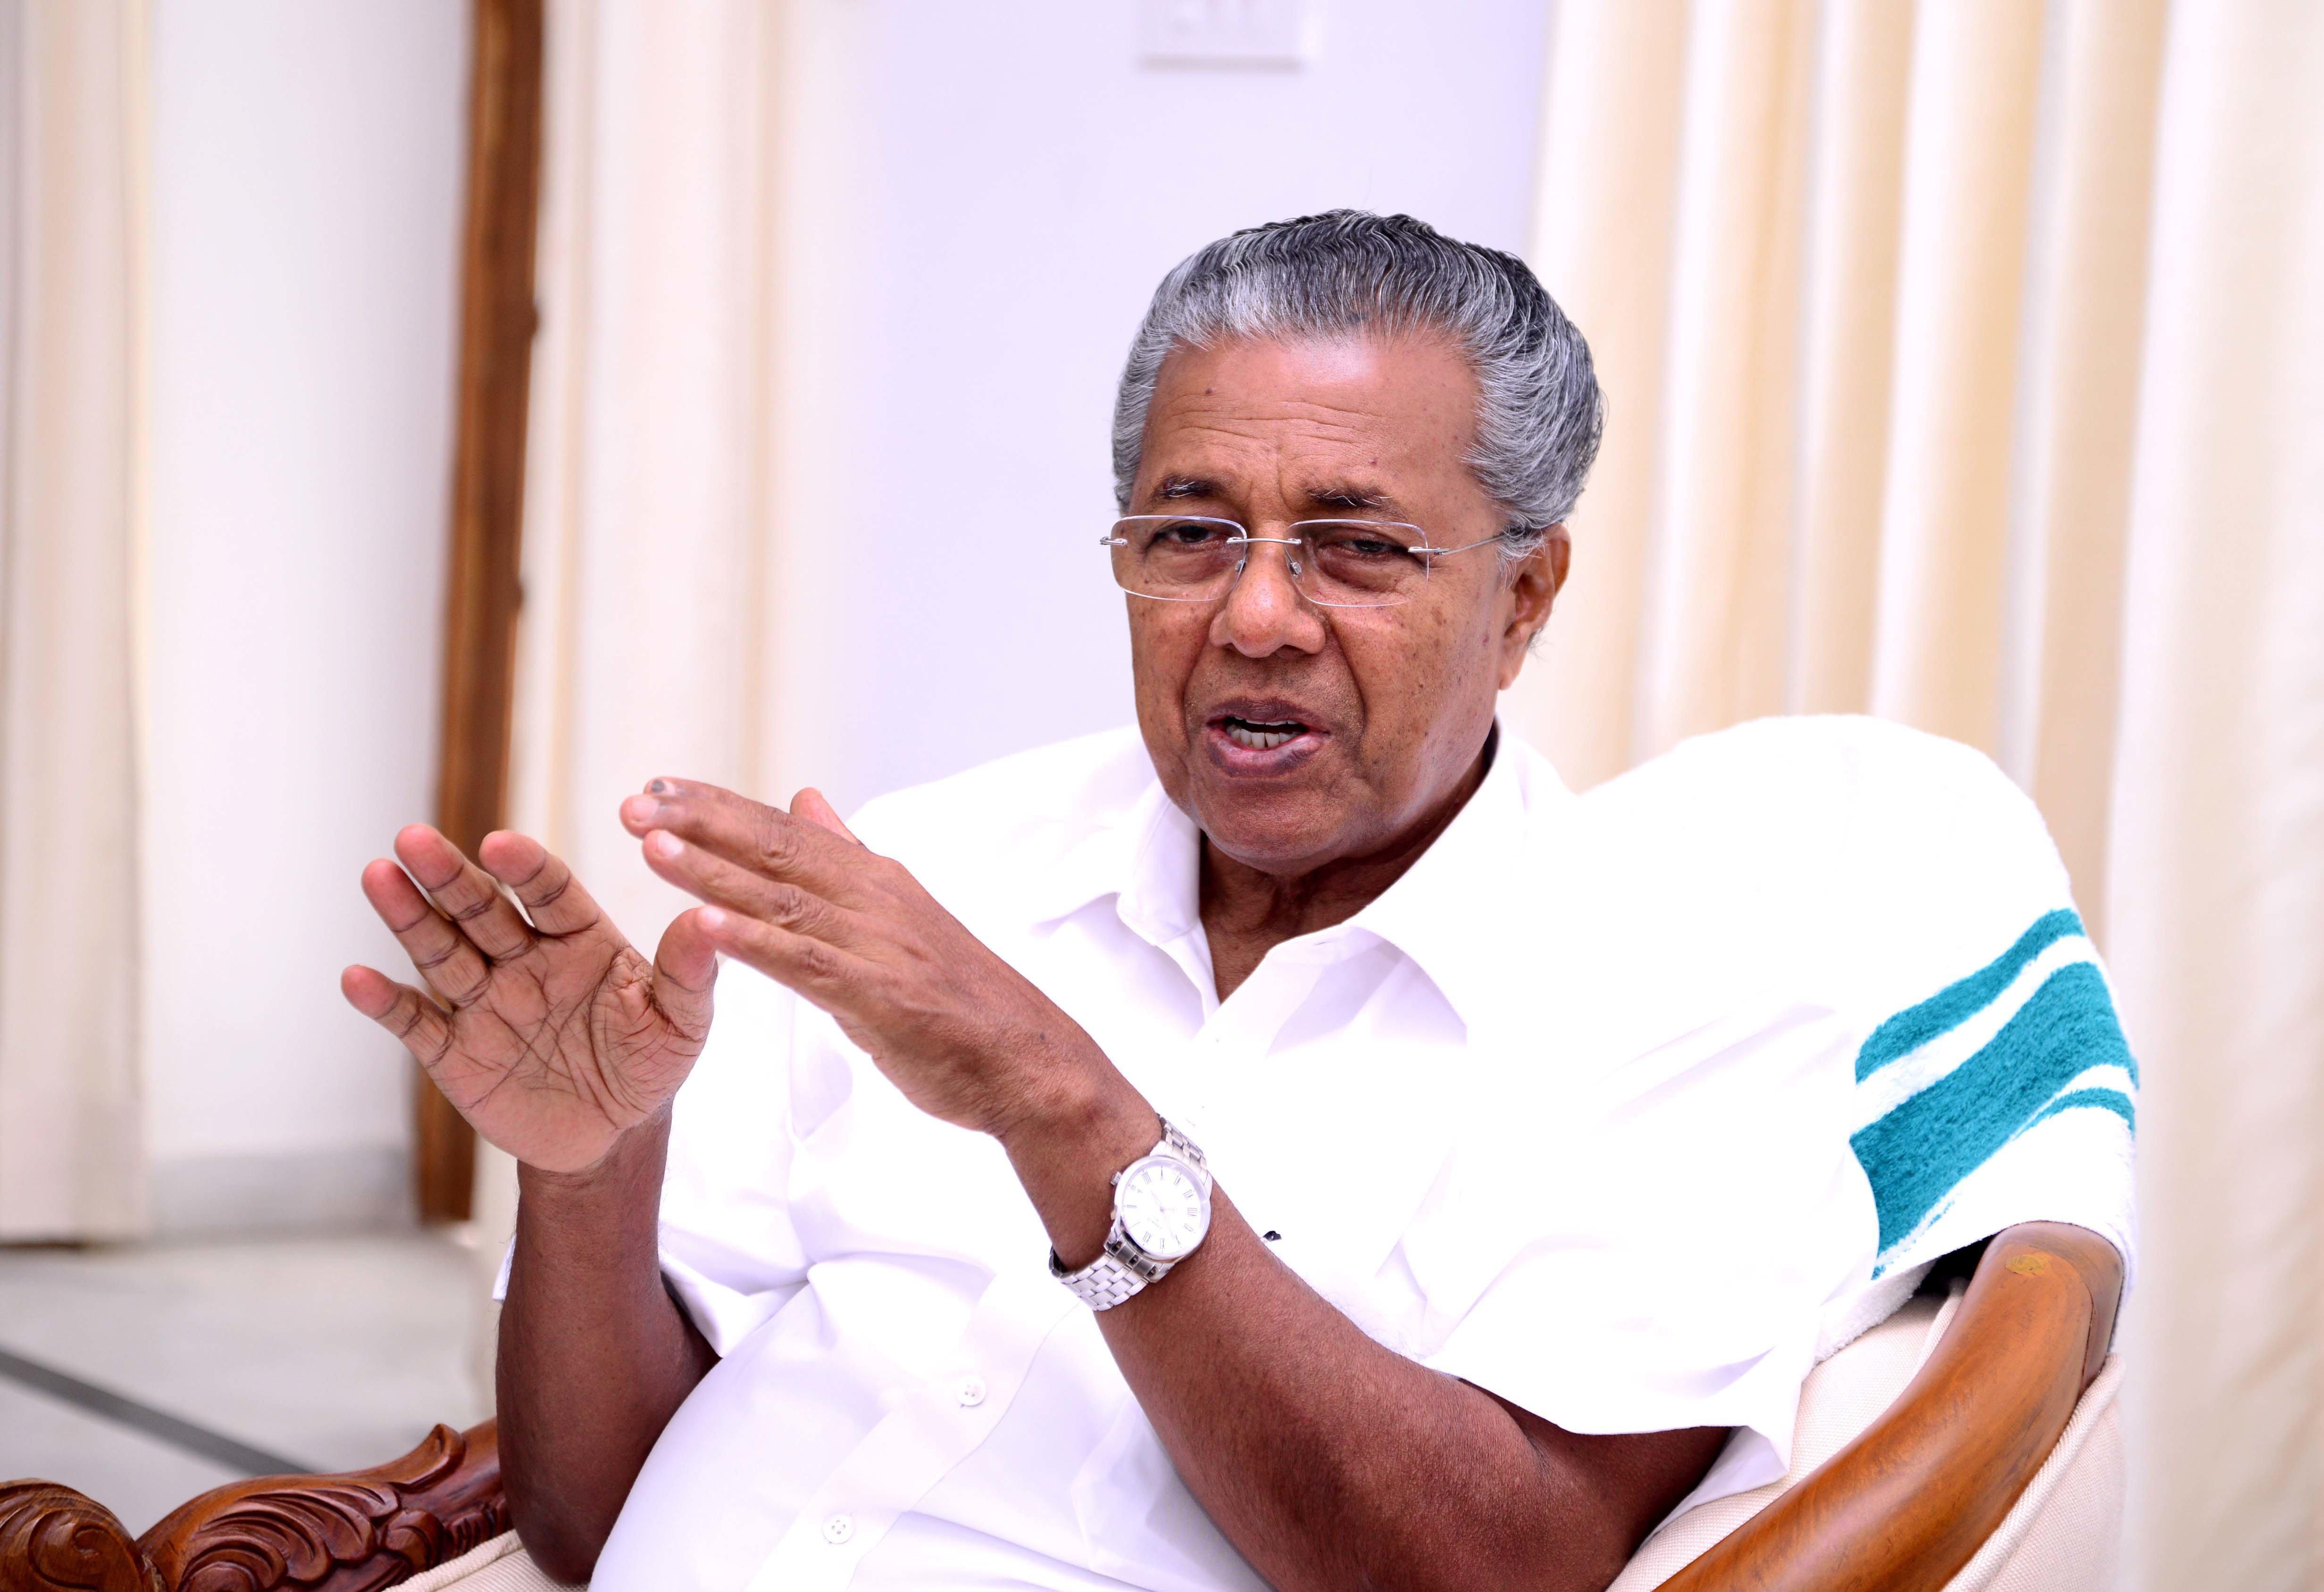 Keralachief minister Pinarayi Vijayan announced the initiative on 1